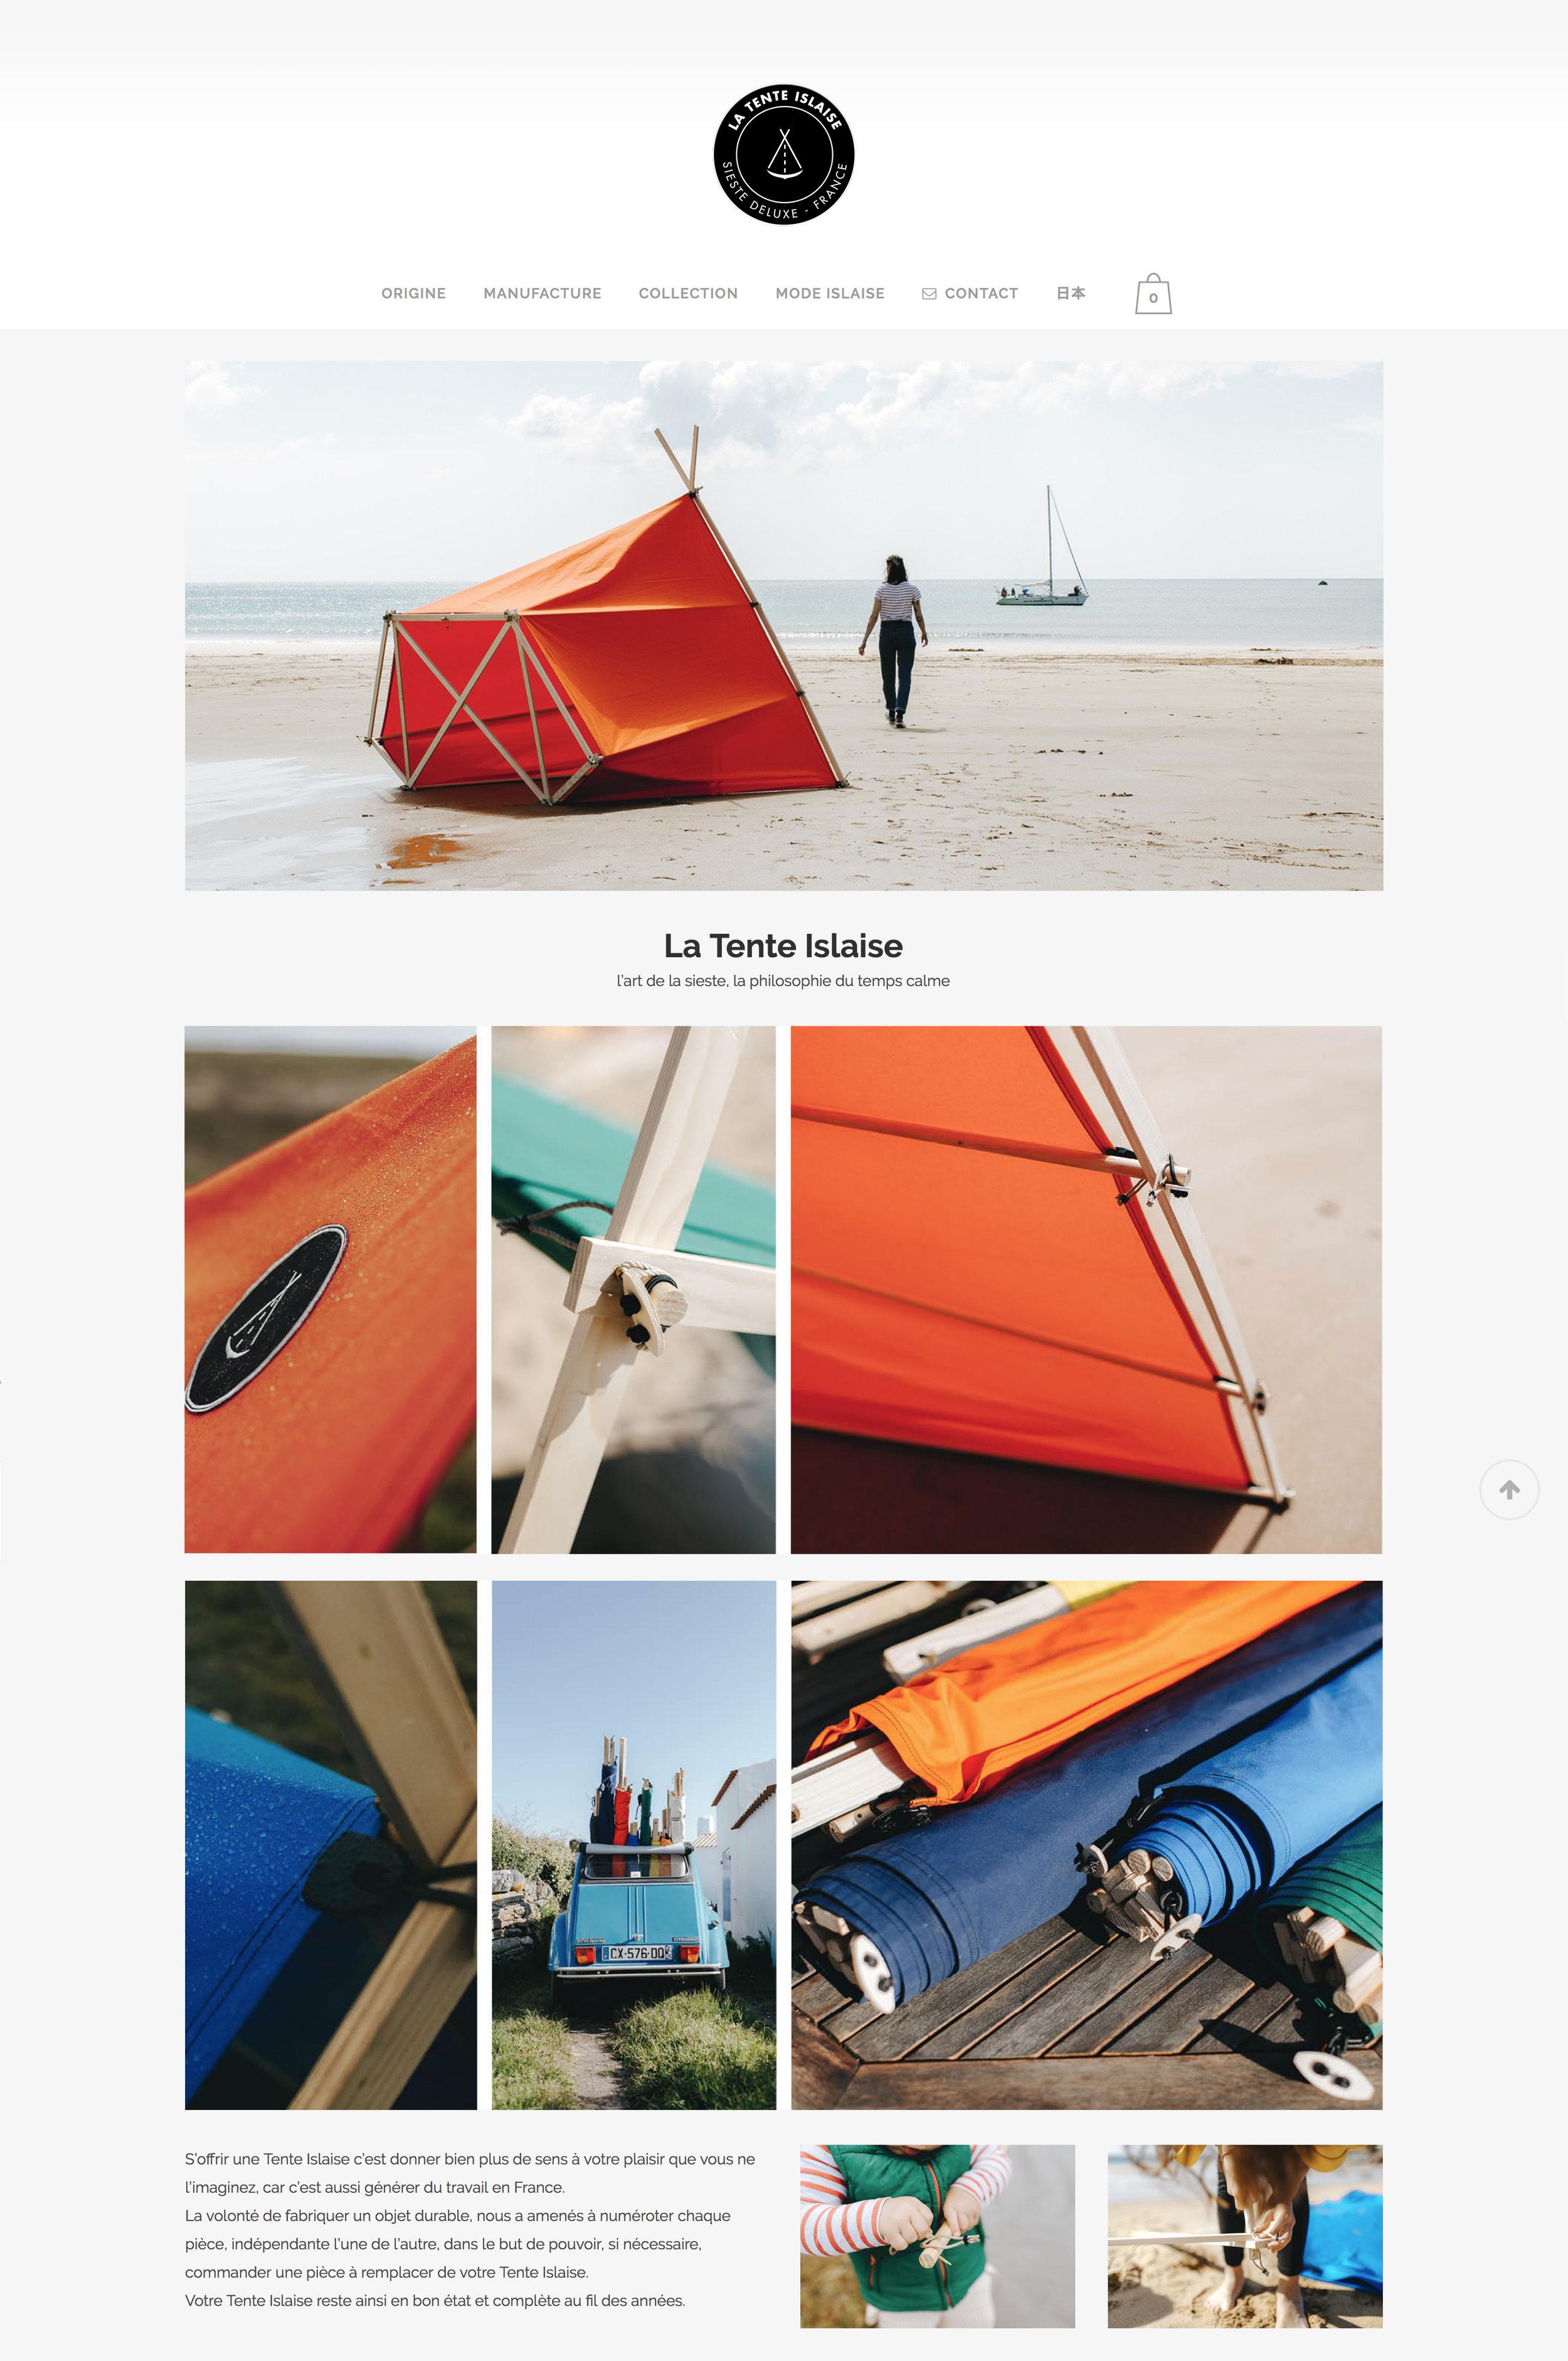 Tente-Islaise-Fabien-Courmont-île-dyeu1.jpg